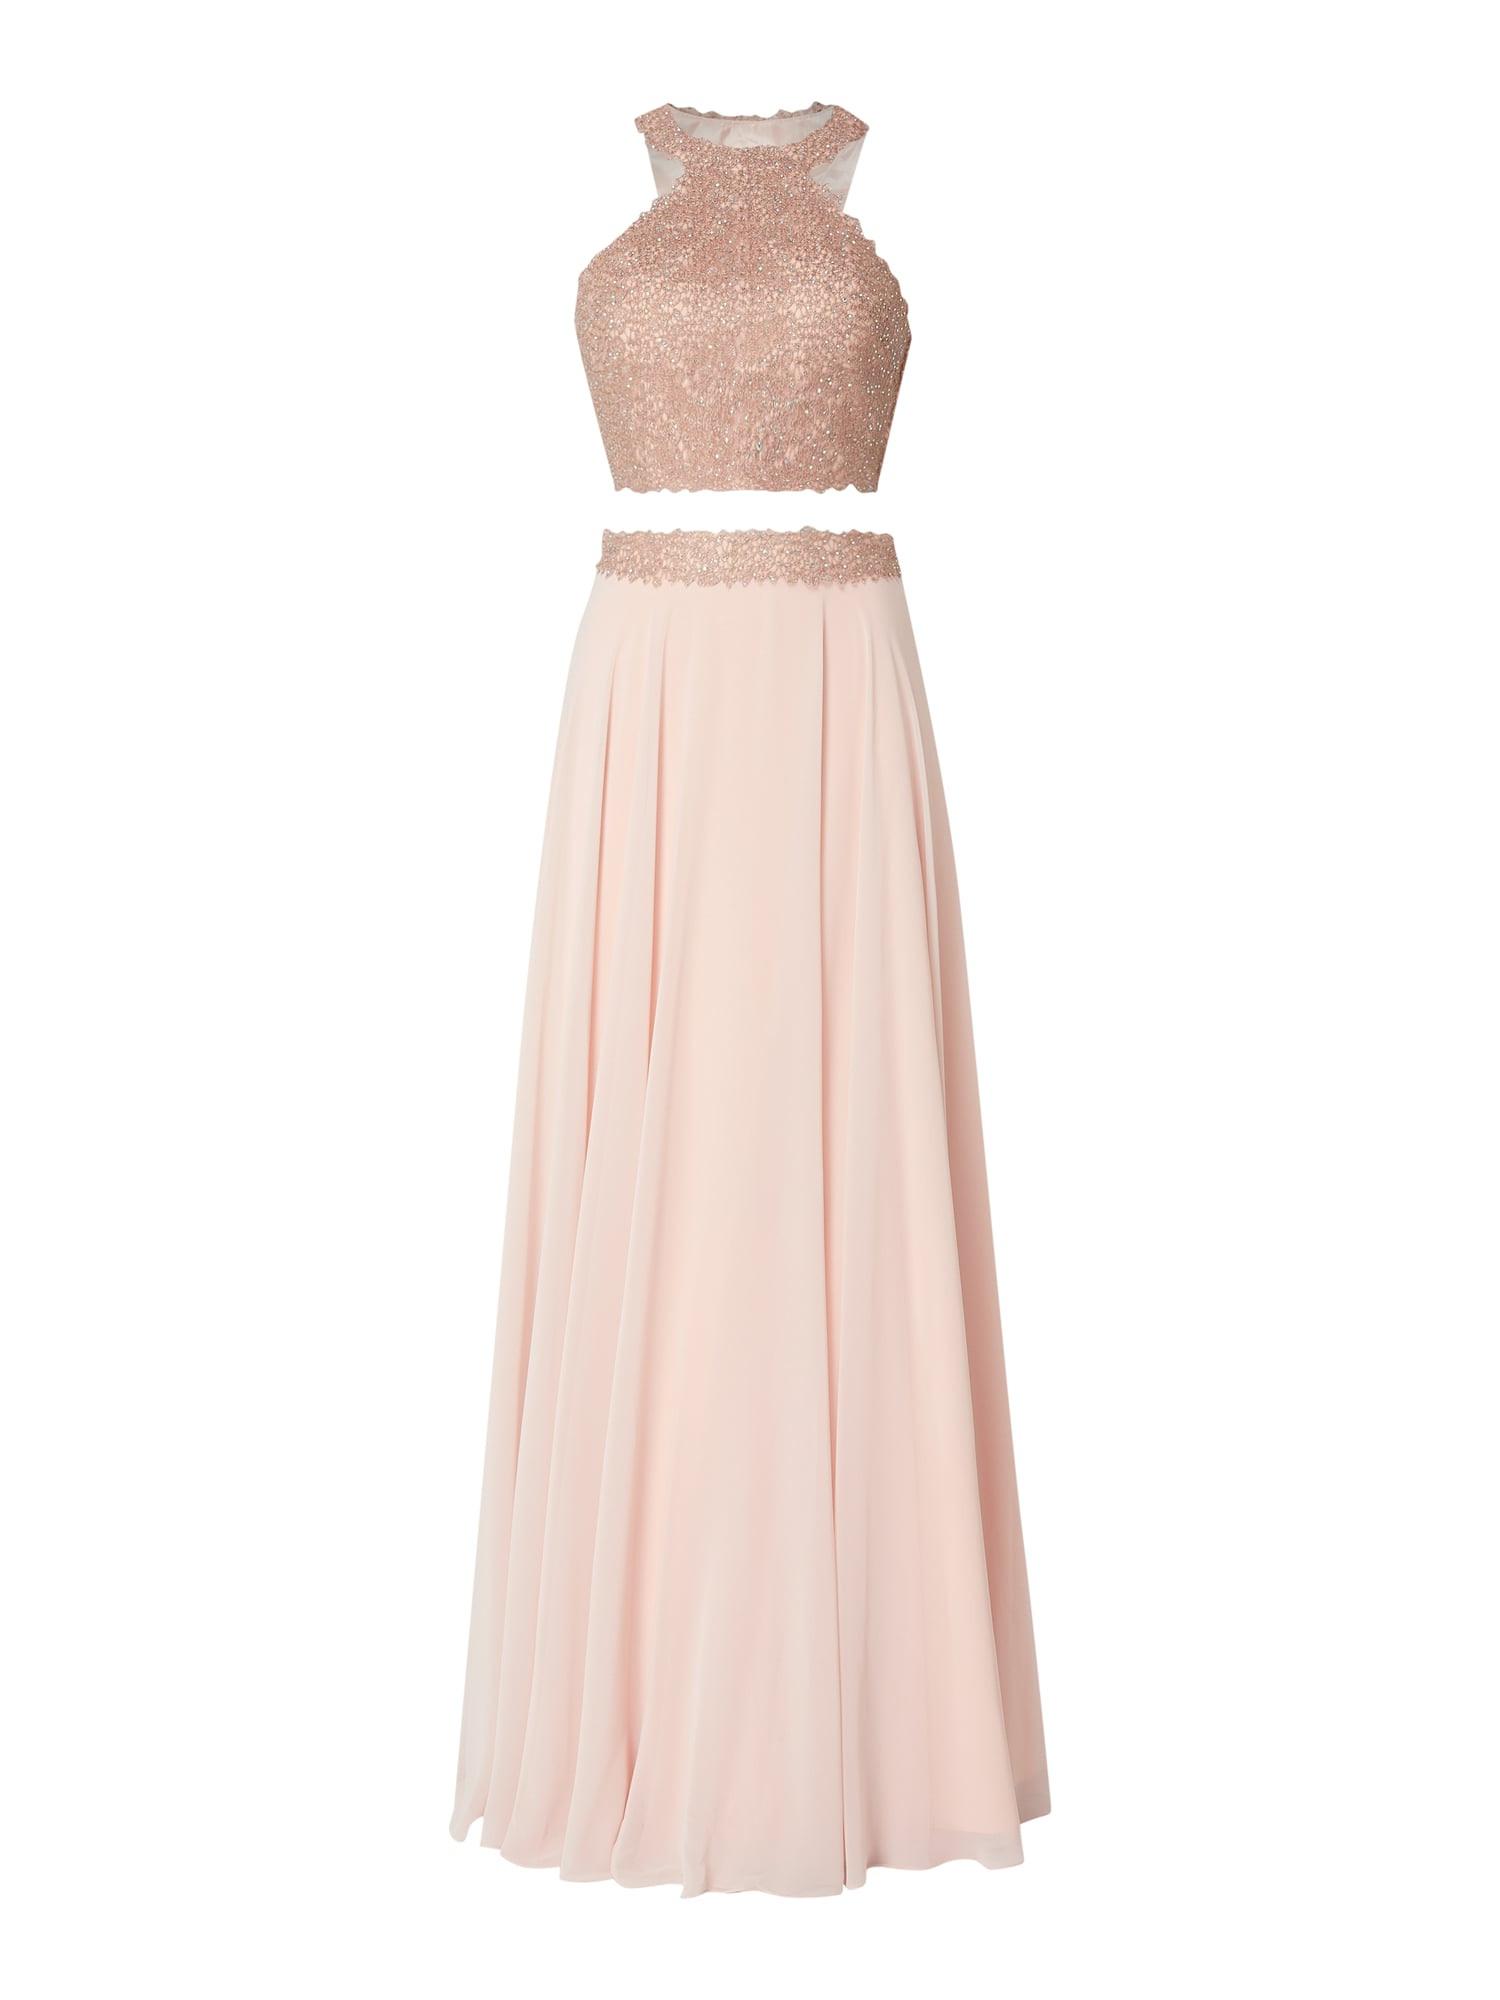 10 Genial Luxuar Abendkleid StylishAbend Kreativ Luxuar Abendkleid Boutique